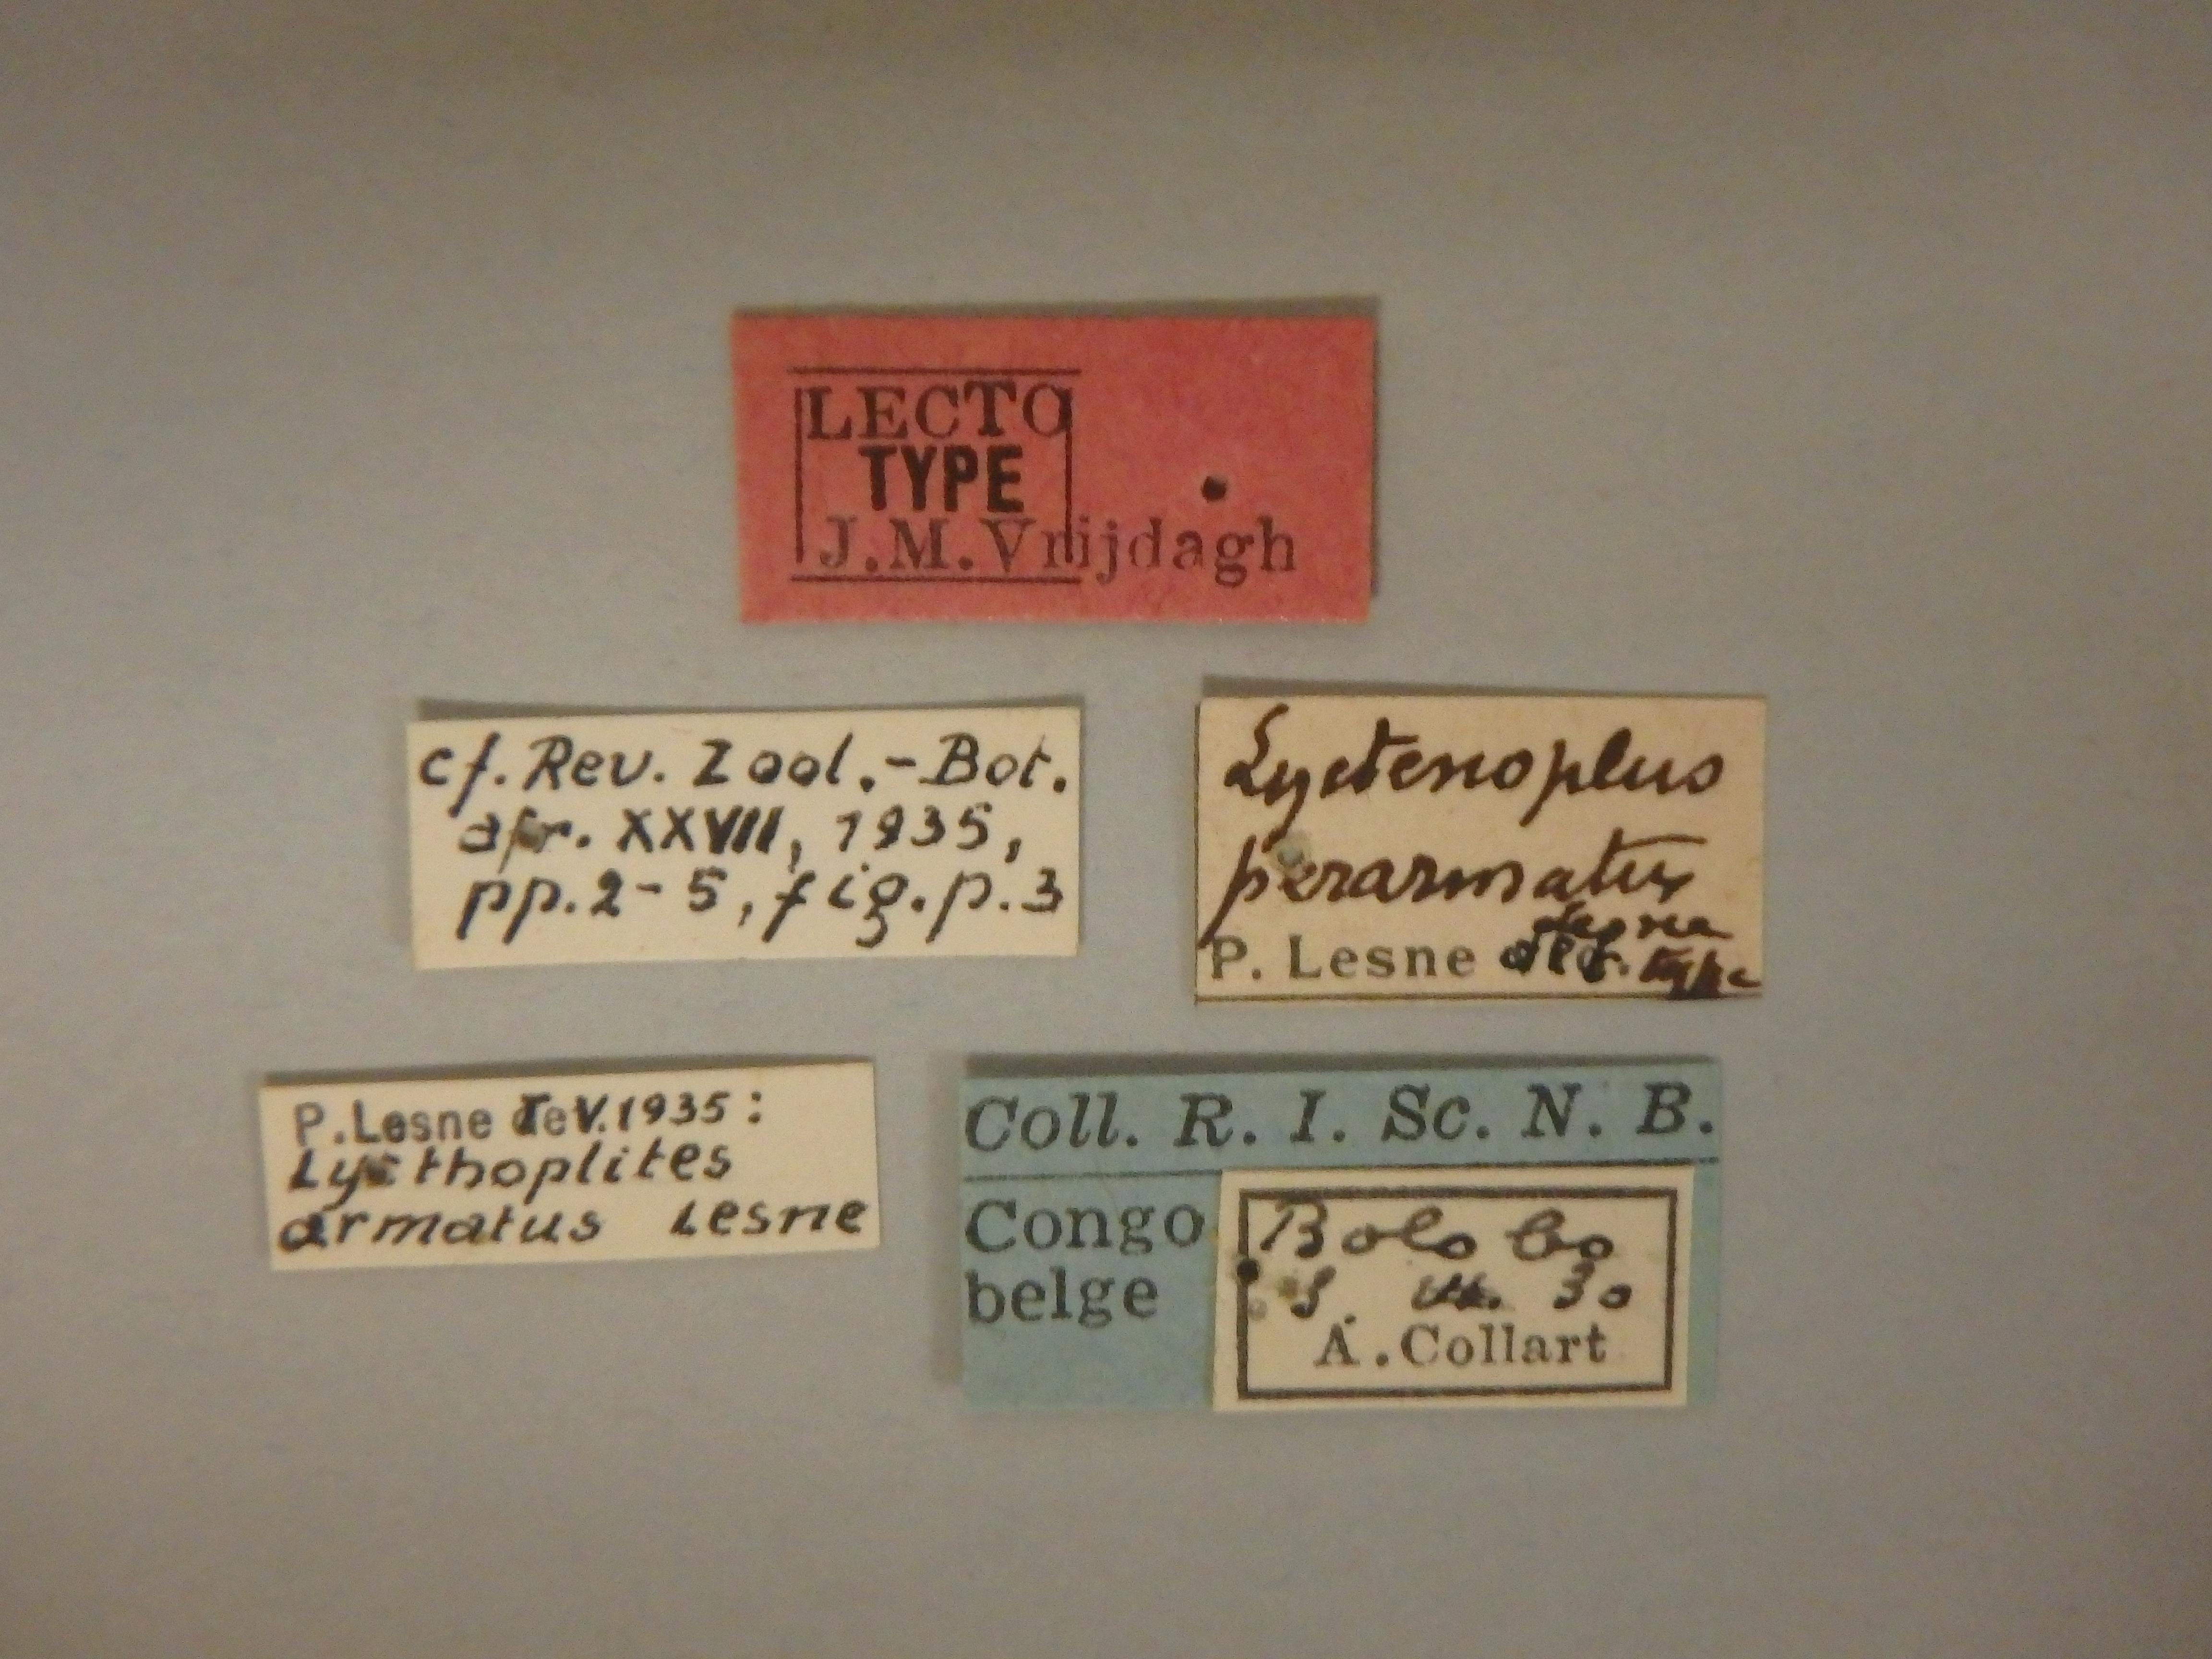 Lycthoplites armatus lt Lb